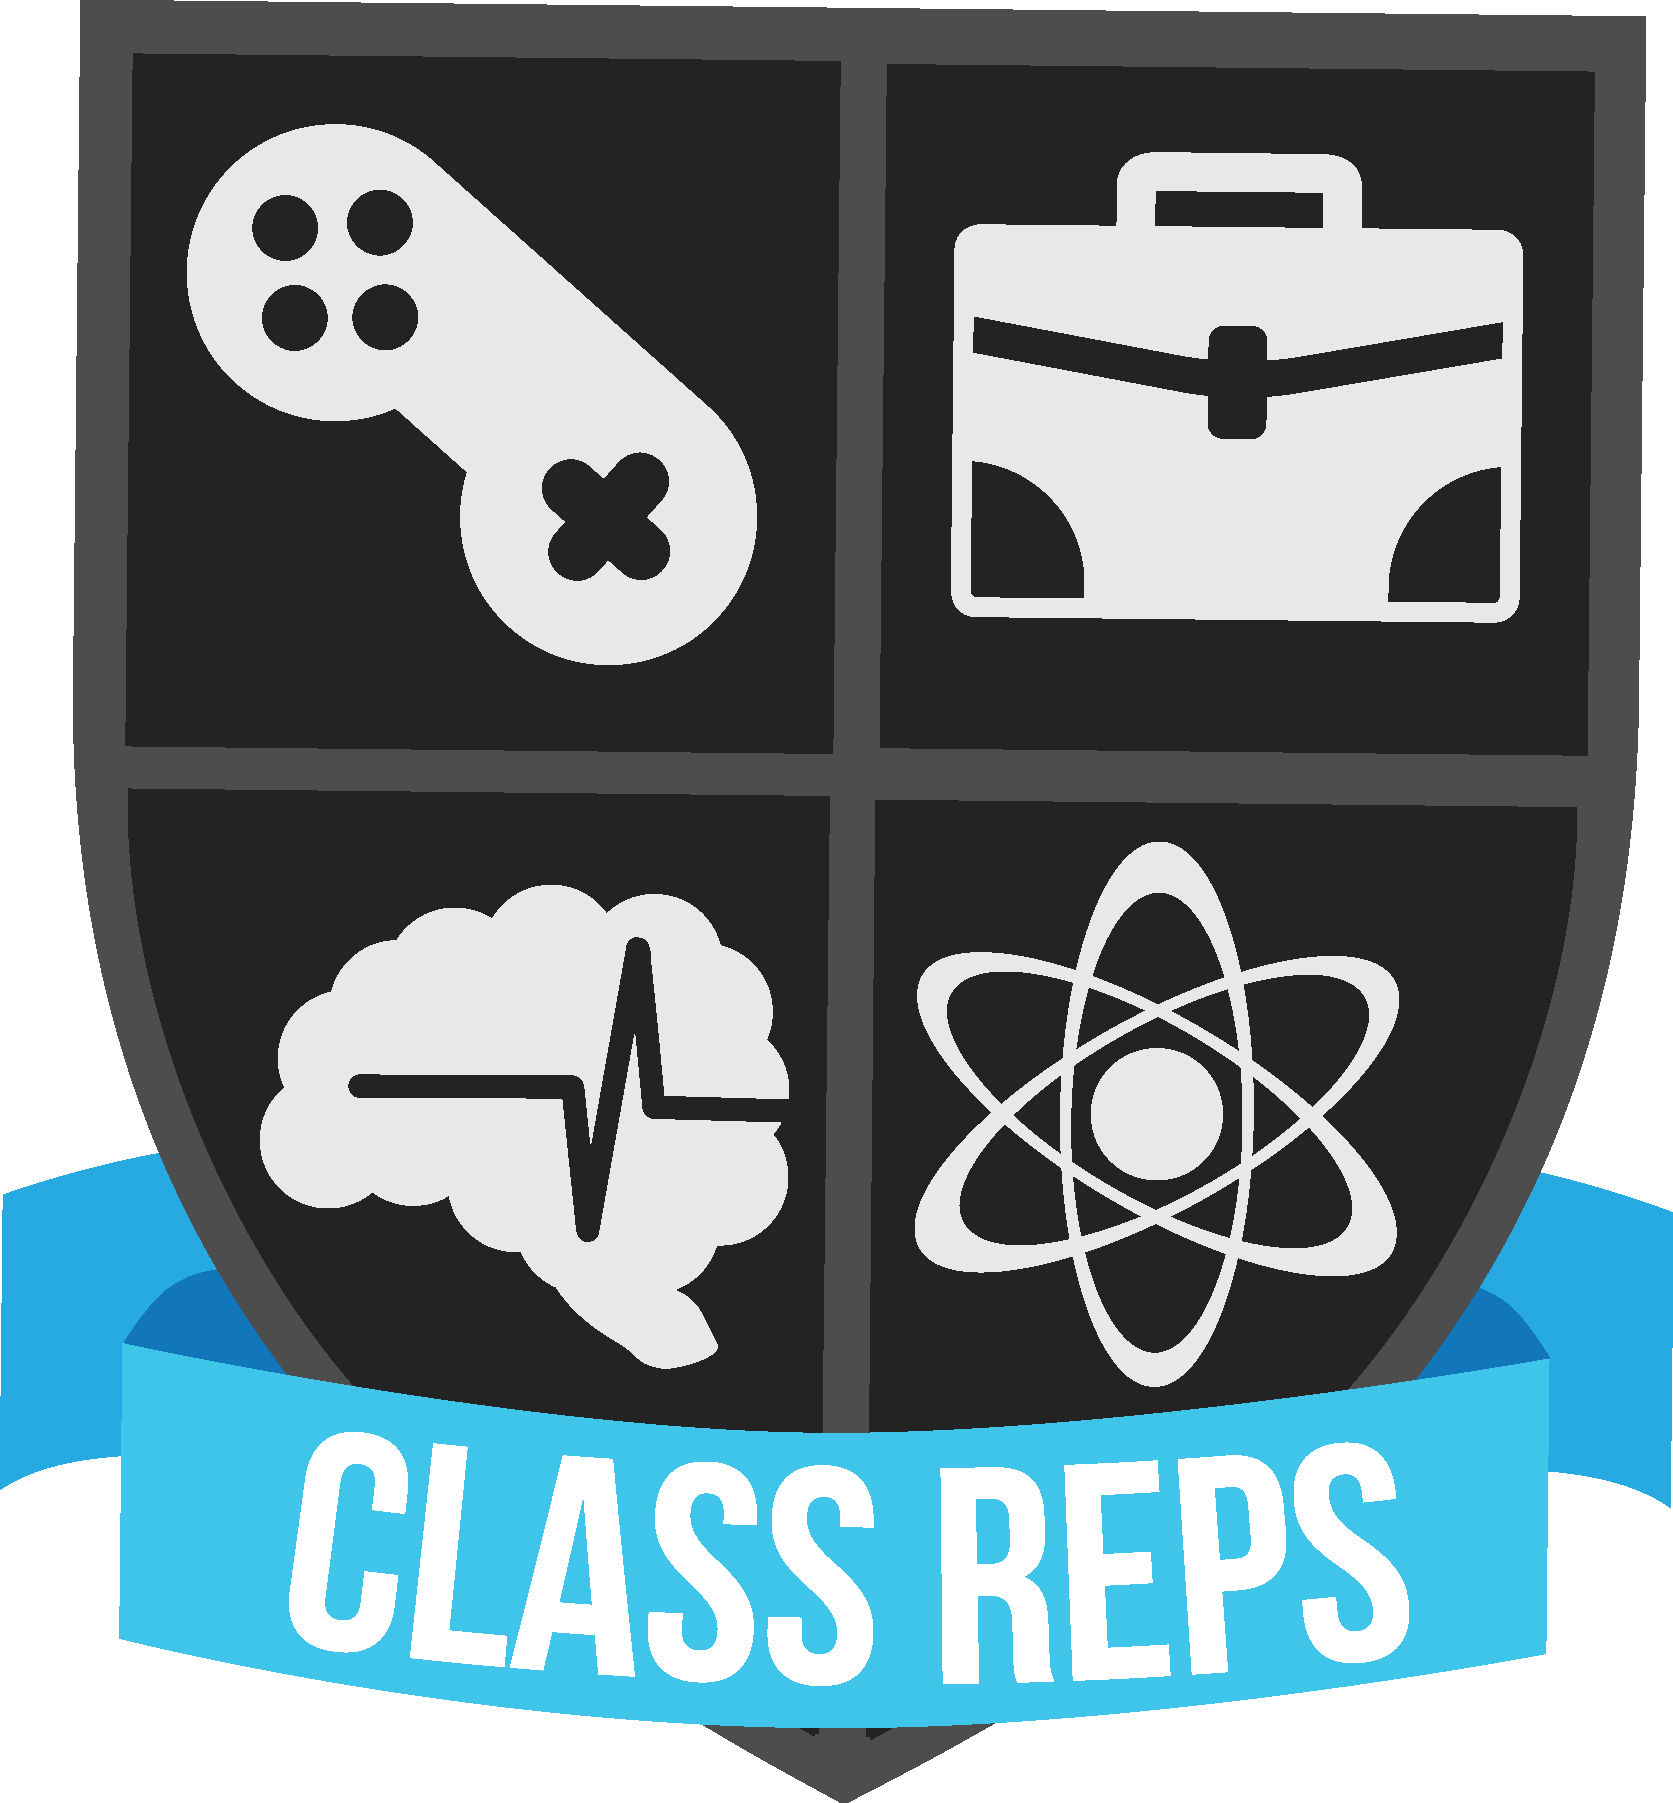 Class Representatives